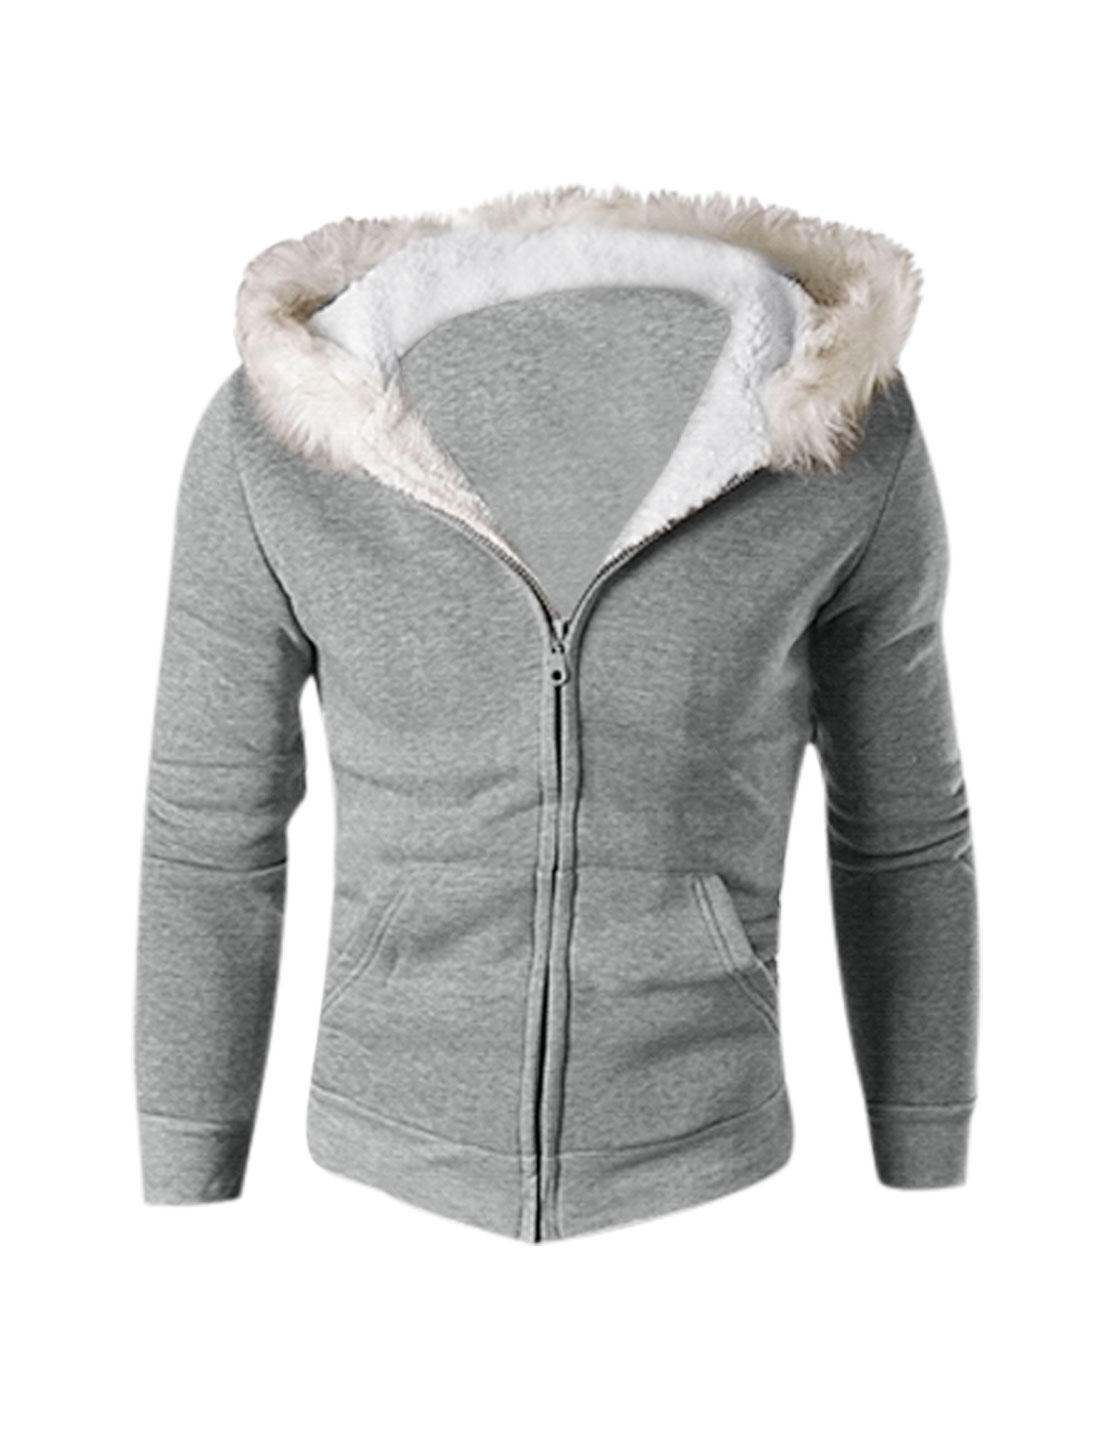 Man Light Gray Zip Closure Long Sleeves Kangaroo Pockets Hoodie Sweatshirt S